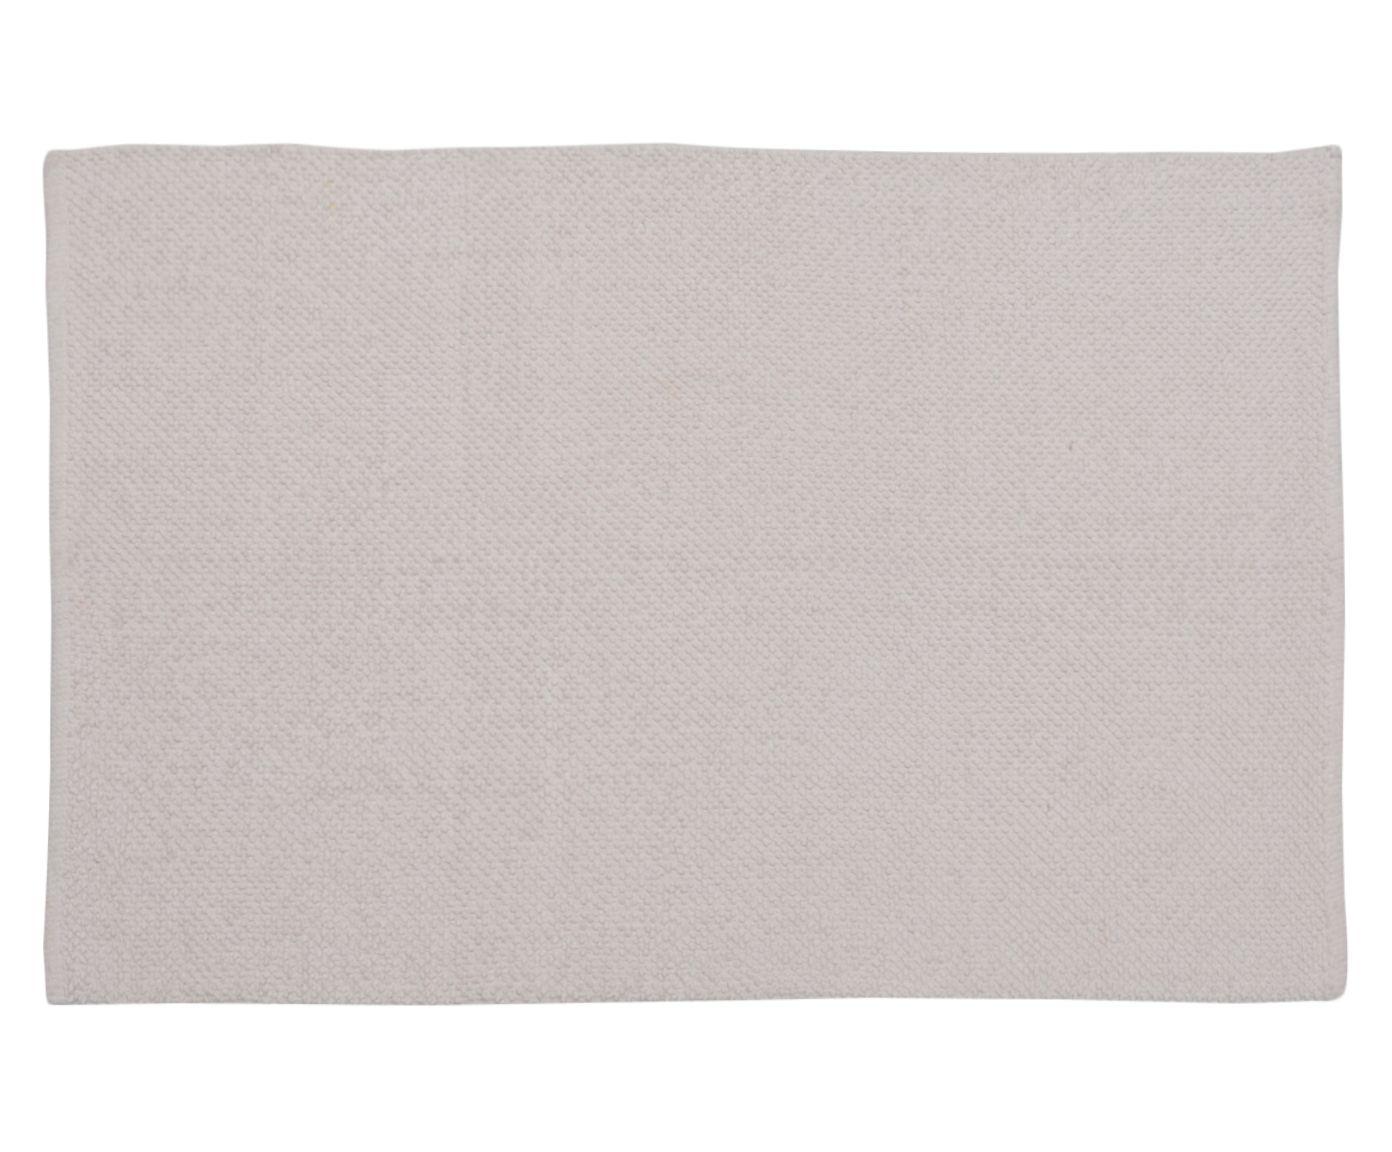 Tapete Indiano Saraswati Branco - 120x180cm | Westwing.com.br